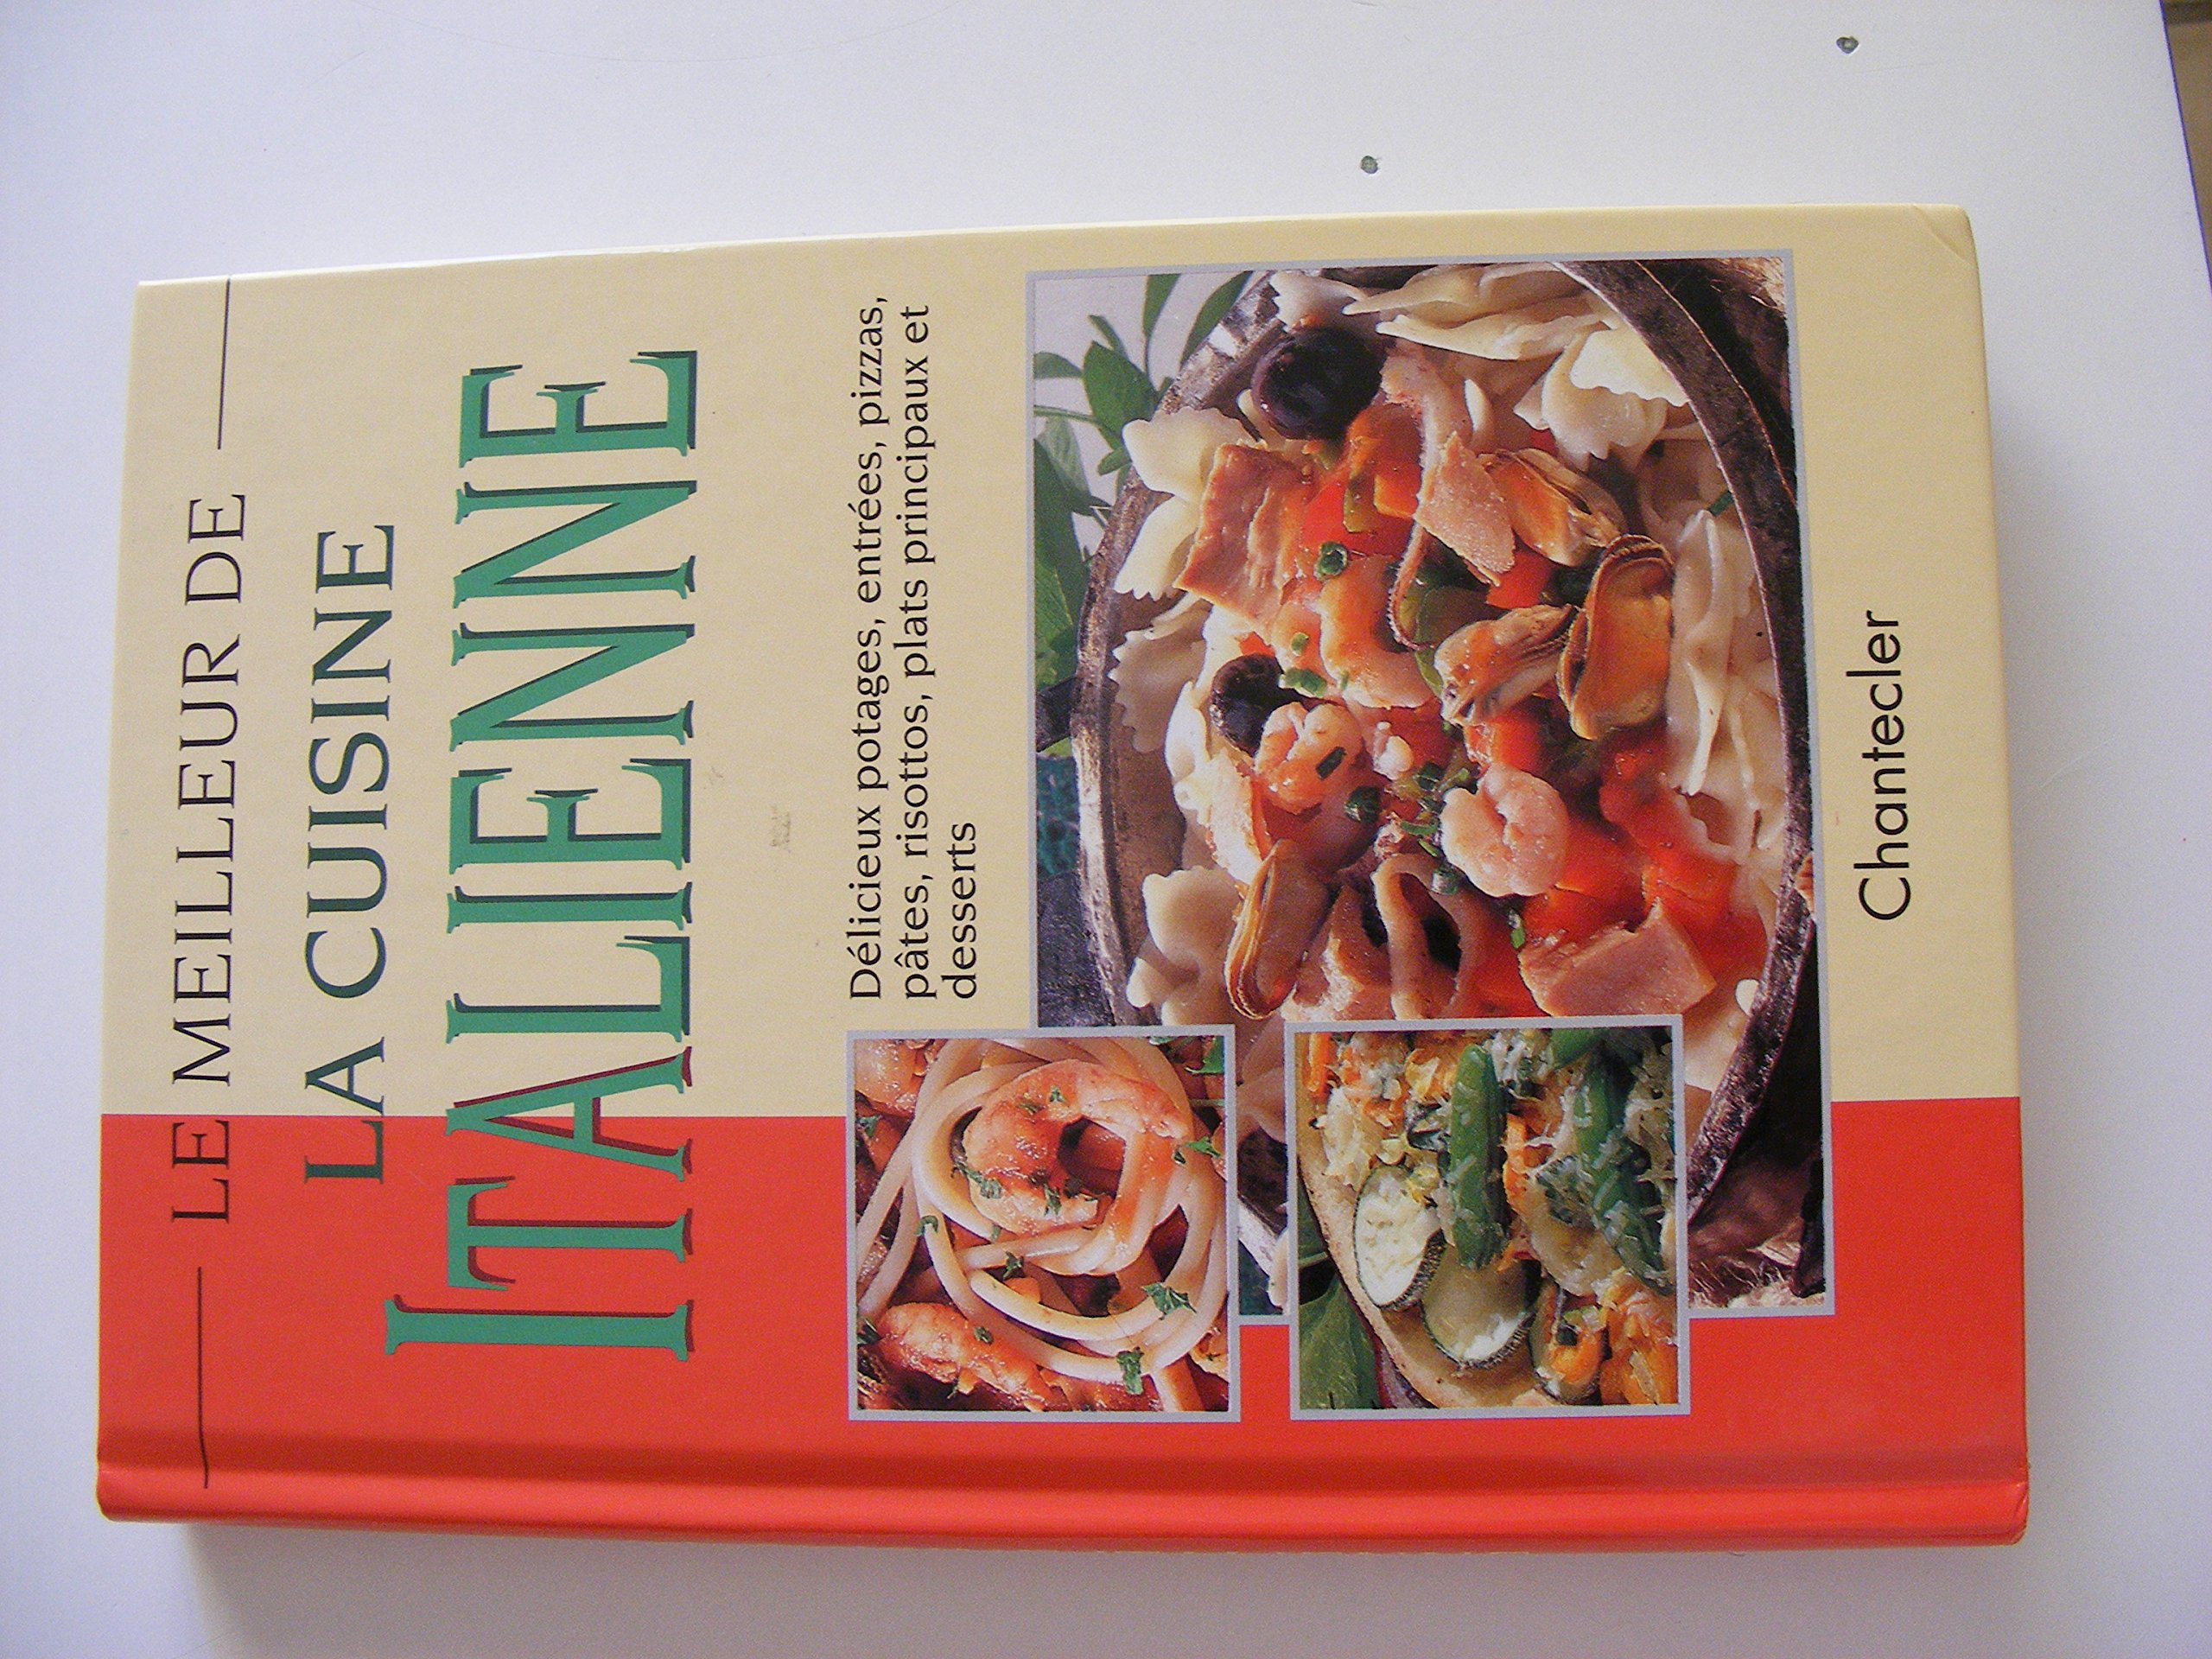 Le Meilleur De La Cuisine Italienne Elke Fuhrmann 9782803433742